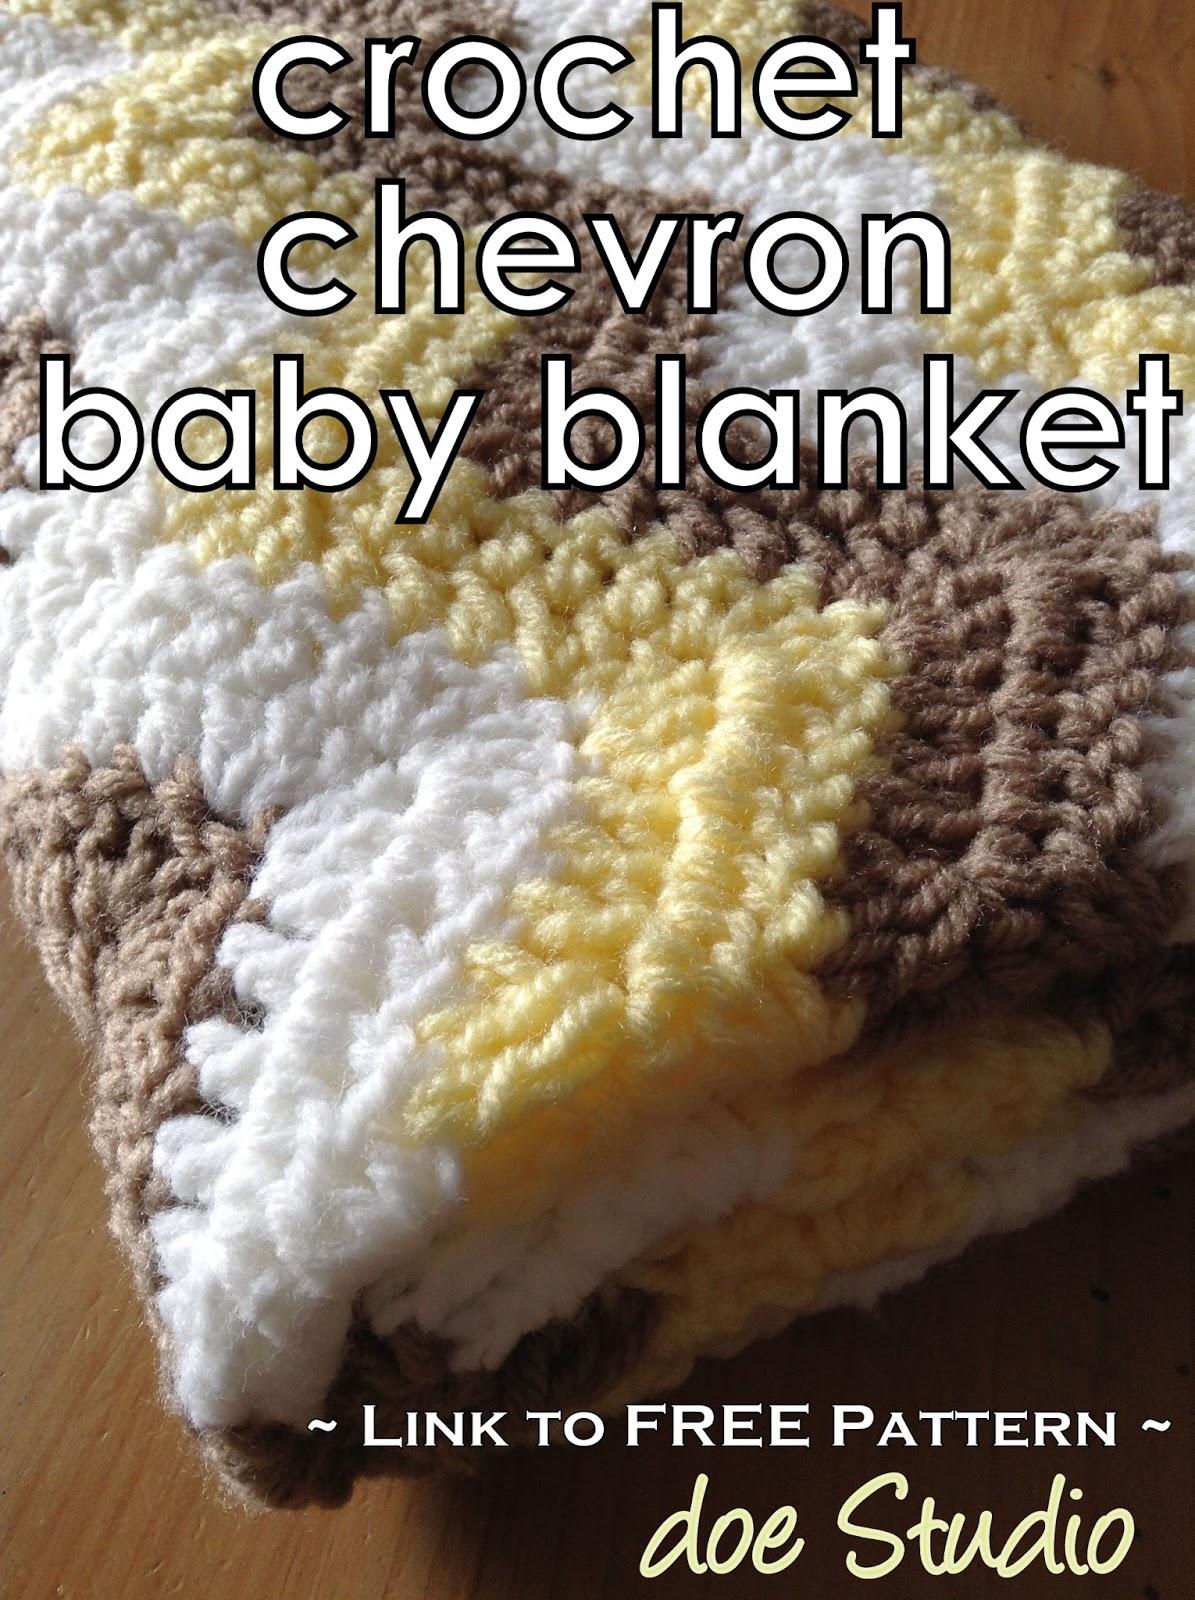 Stitch & Wick: ~free pattern~ Crochet Chevron Baby Blanket